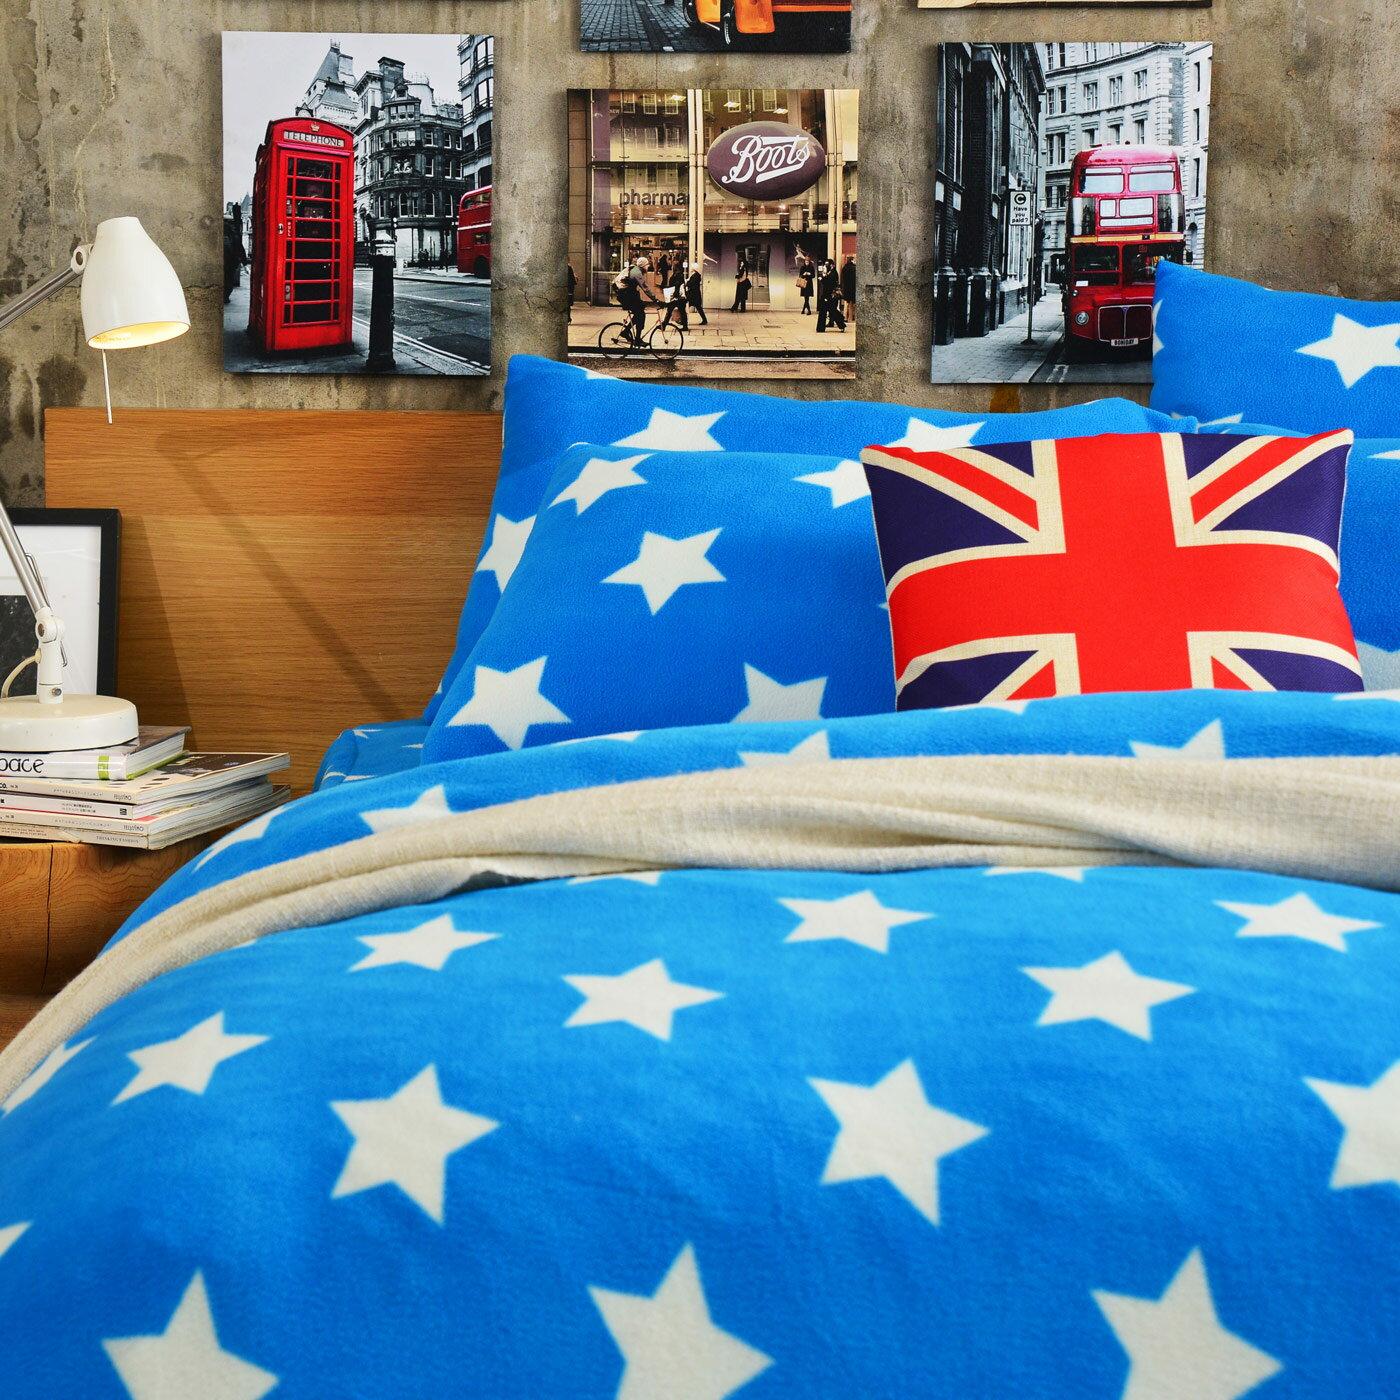 Pure One 超保暖搖粒絨 - 迷戀星-藍 @ 雙人四件式床包被套組 @ 台灣製 @ SGS檢驗合格 - 限時優惠好康折扣